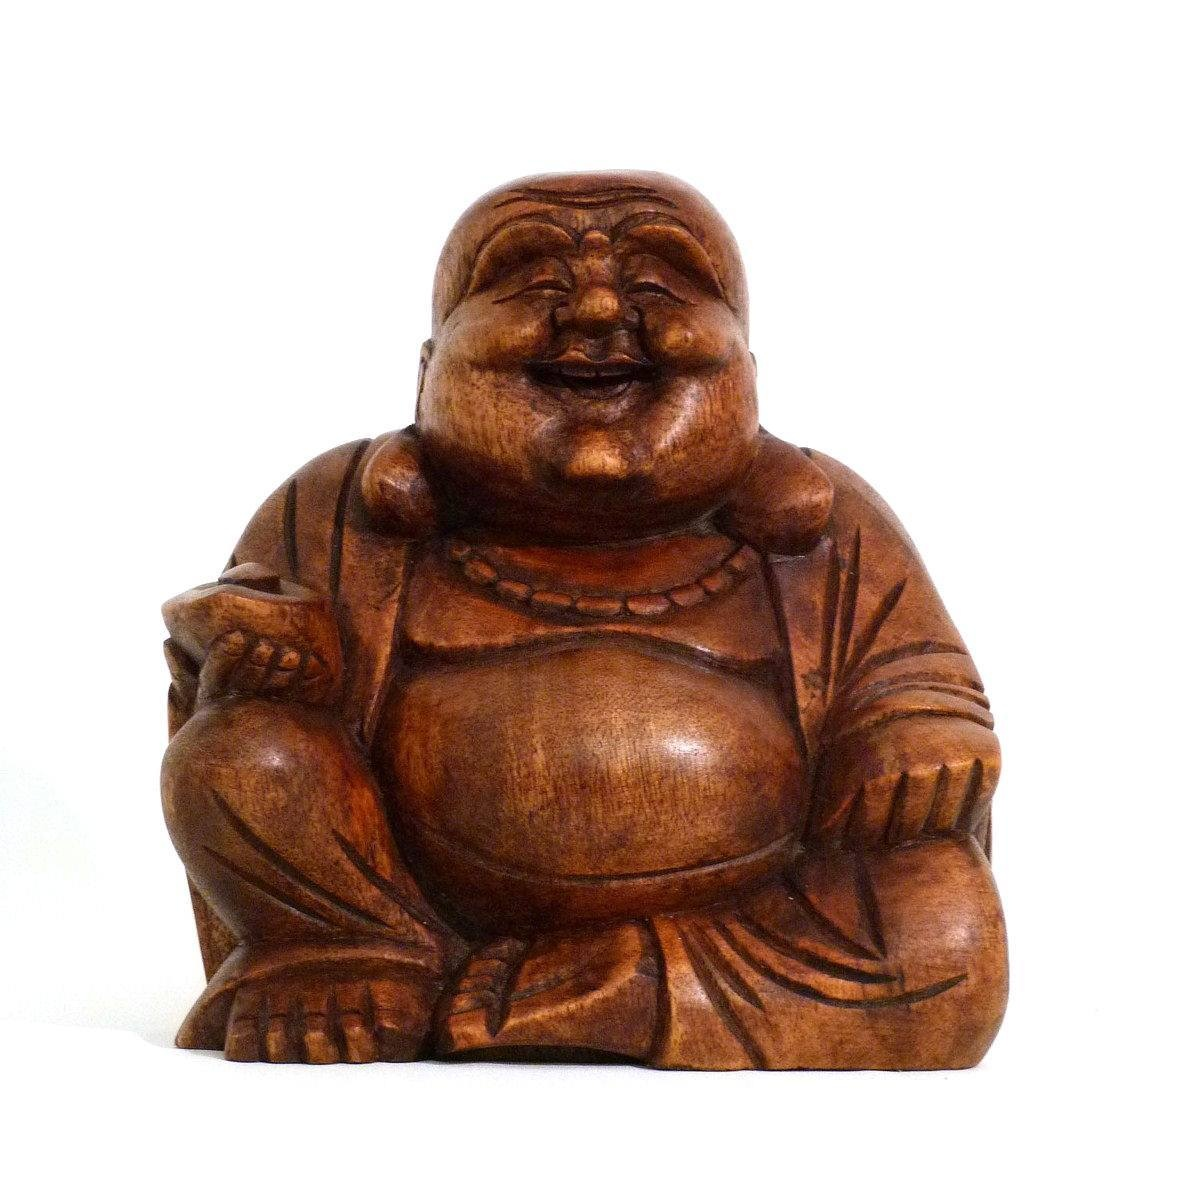 happy buddha holz figur skulptur abstrakt holzfigur statue afrika asia glucksbringer handarbeit deko